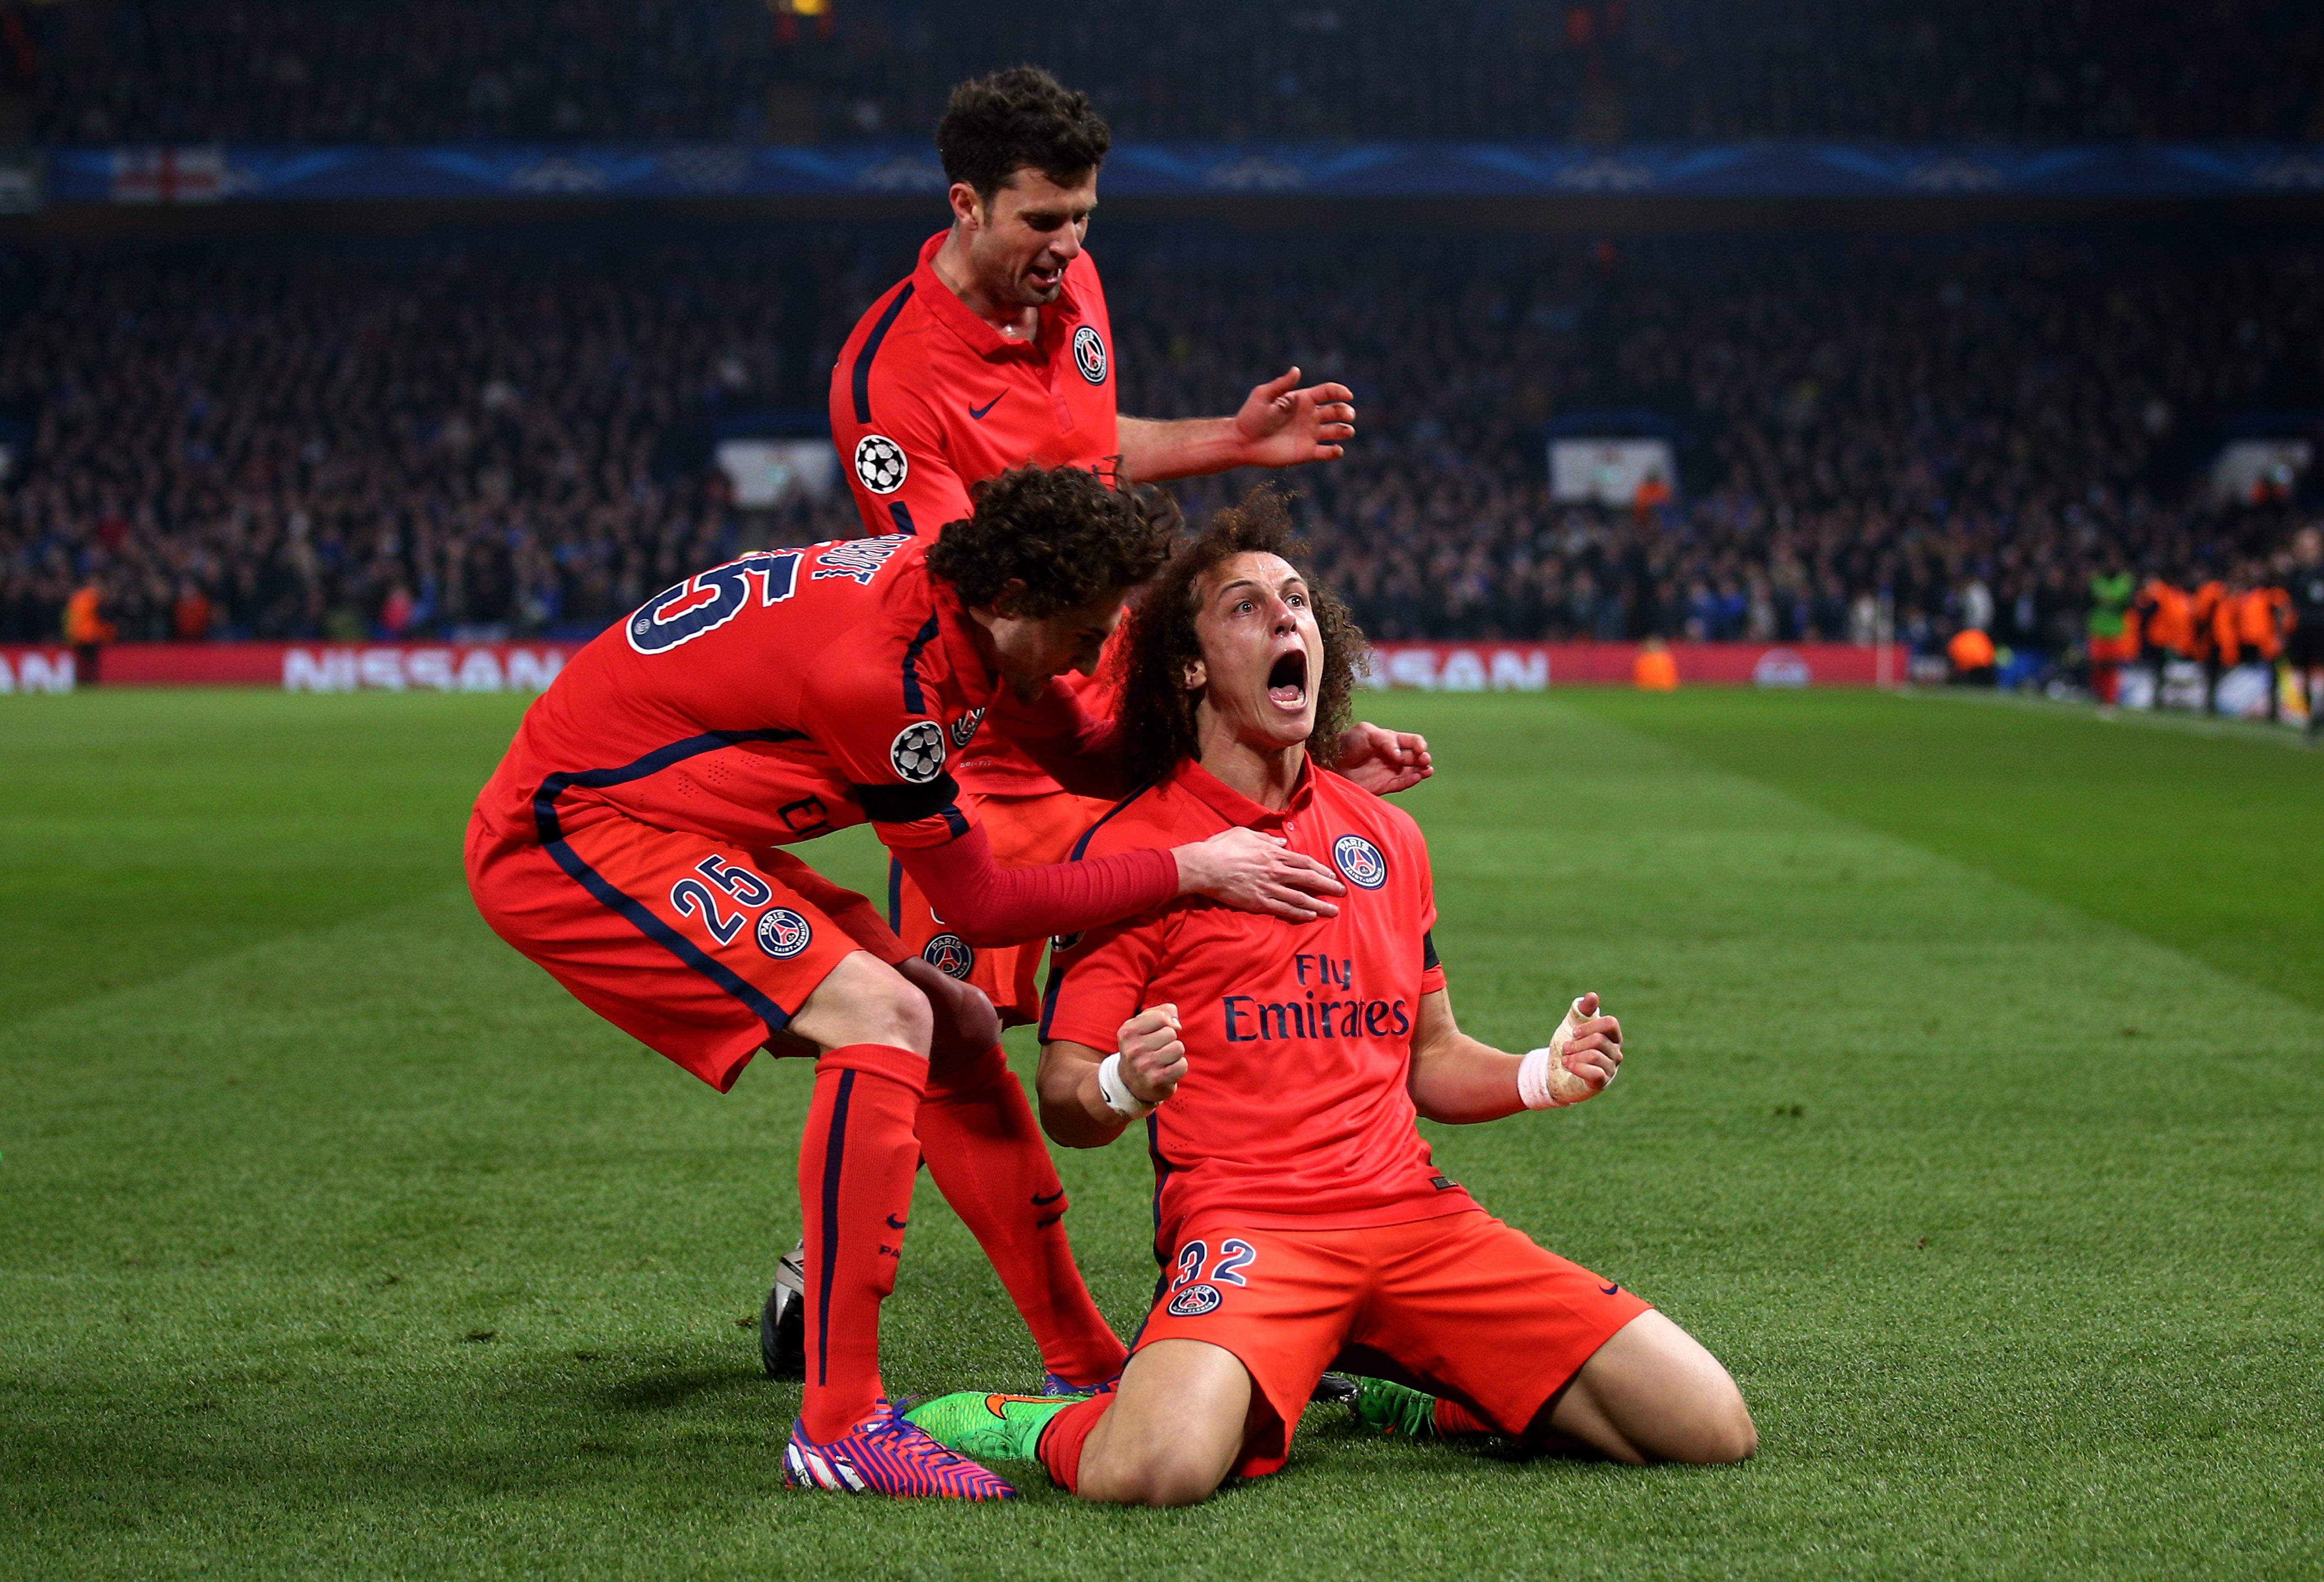 Oscar celebrates David Luiz's return to Chelsea following move from PSG